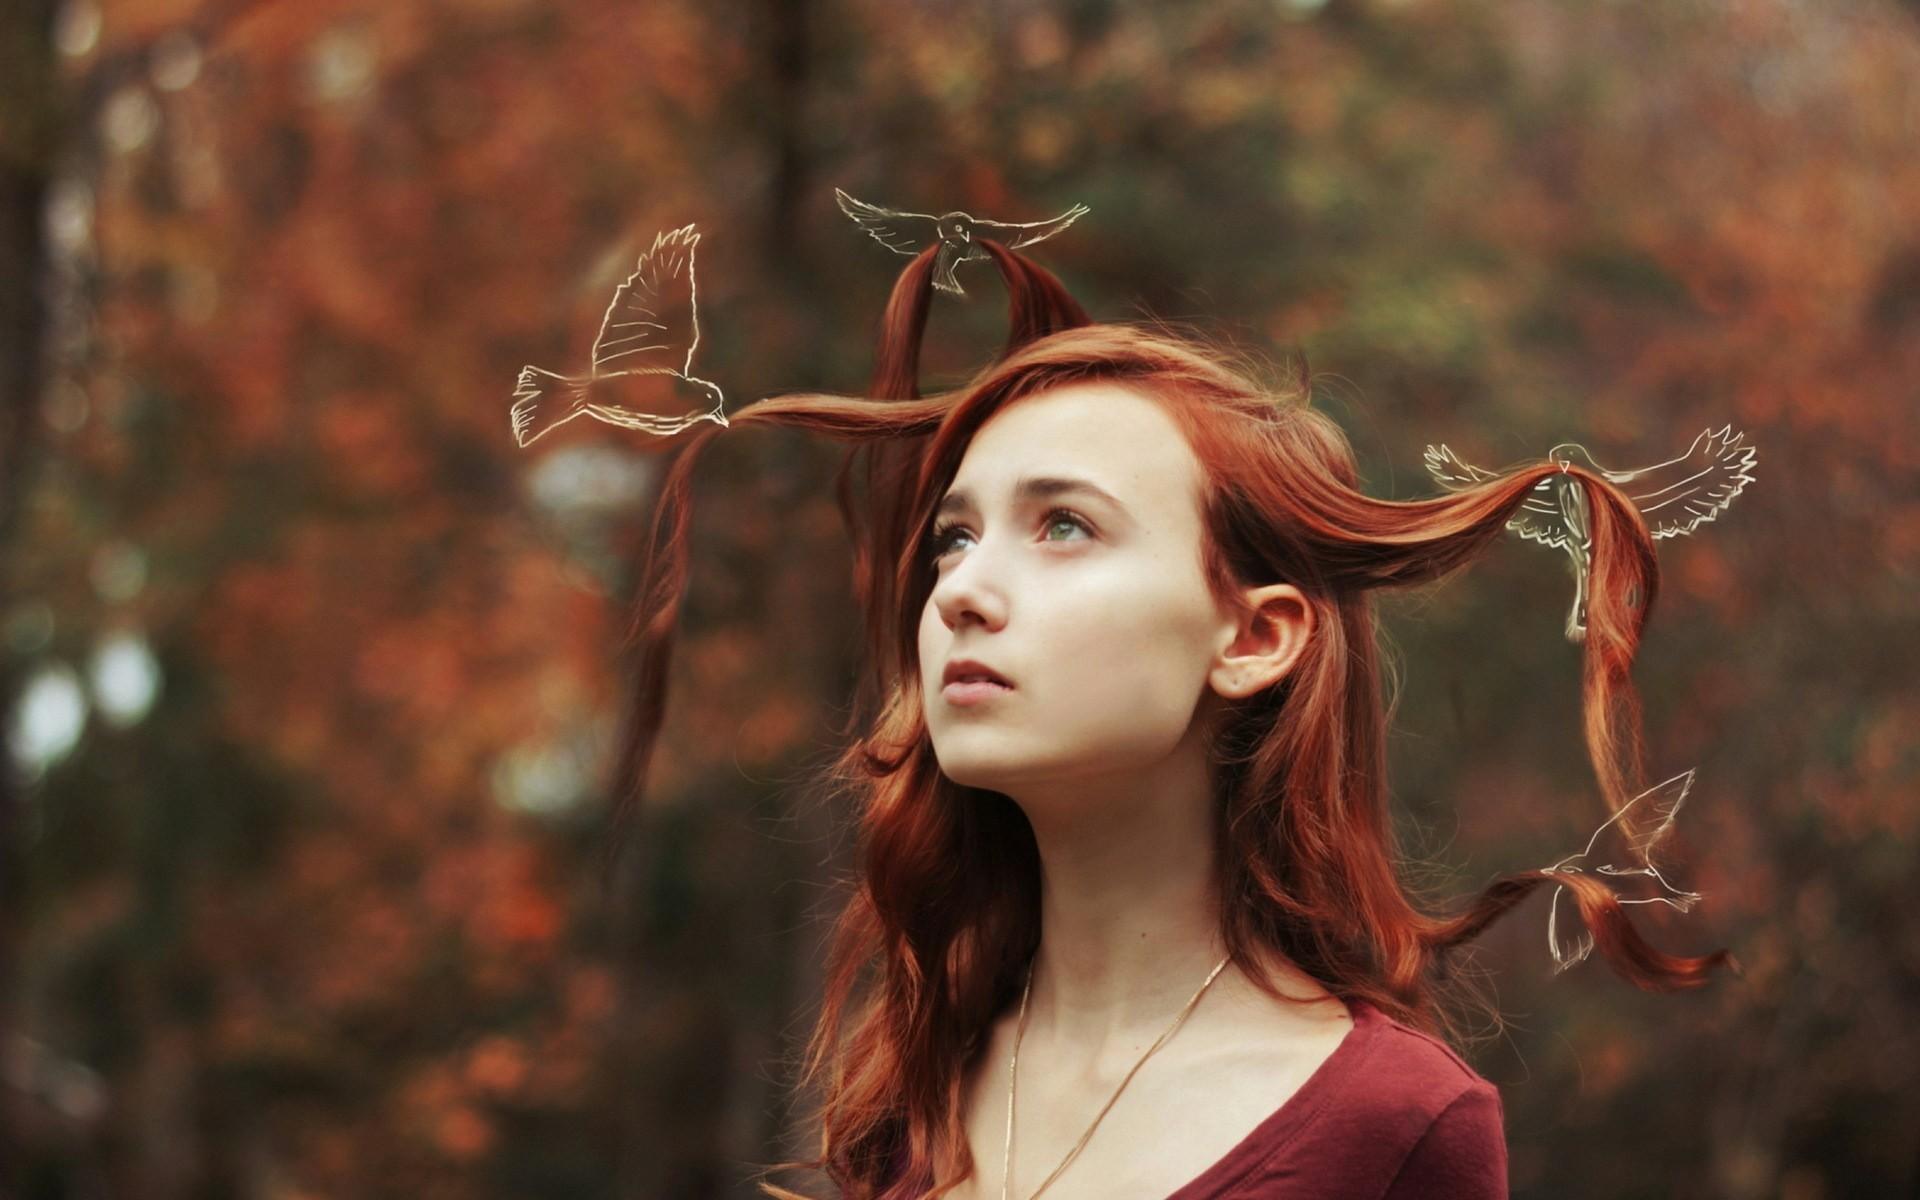 … redhead girl birds art photo wallpaper free download for  desktop, forest, autumn,